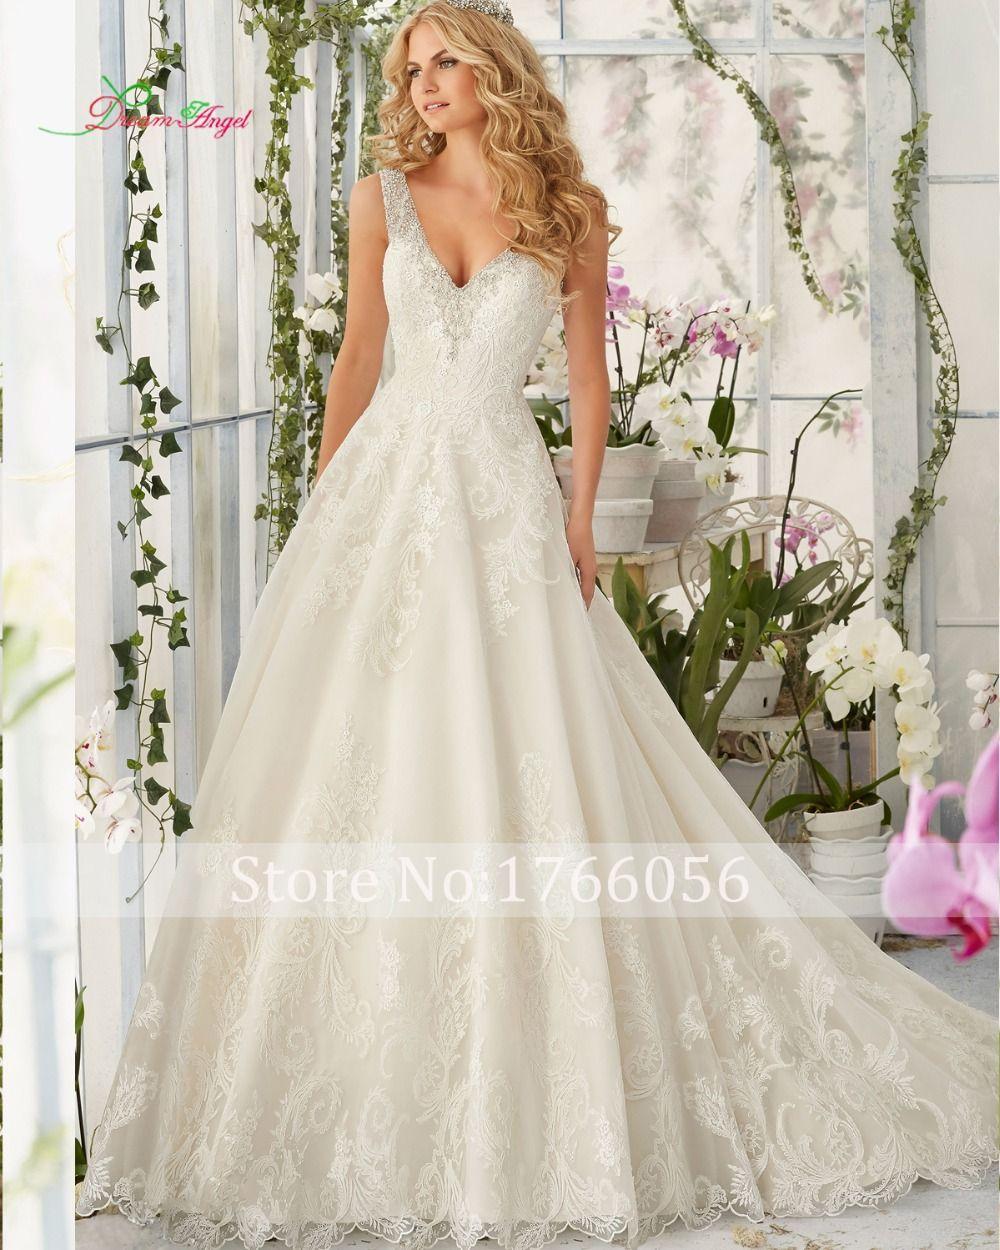 Silver wedding dresses plus size  New Designer V Neck Appliques A Line Lace Vintage Wedding Dress